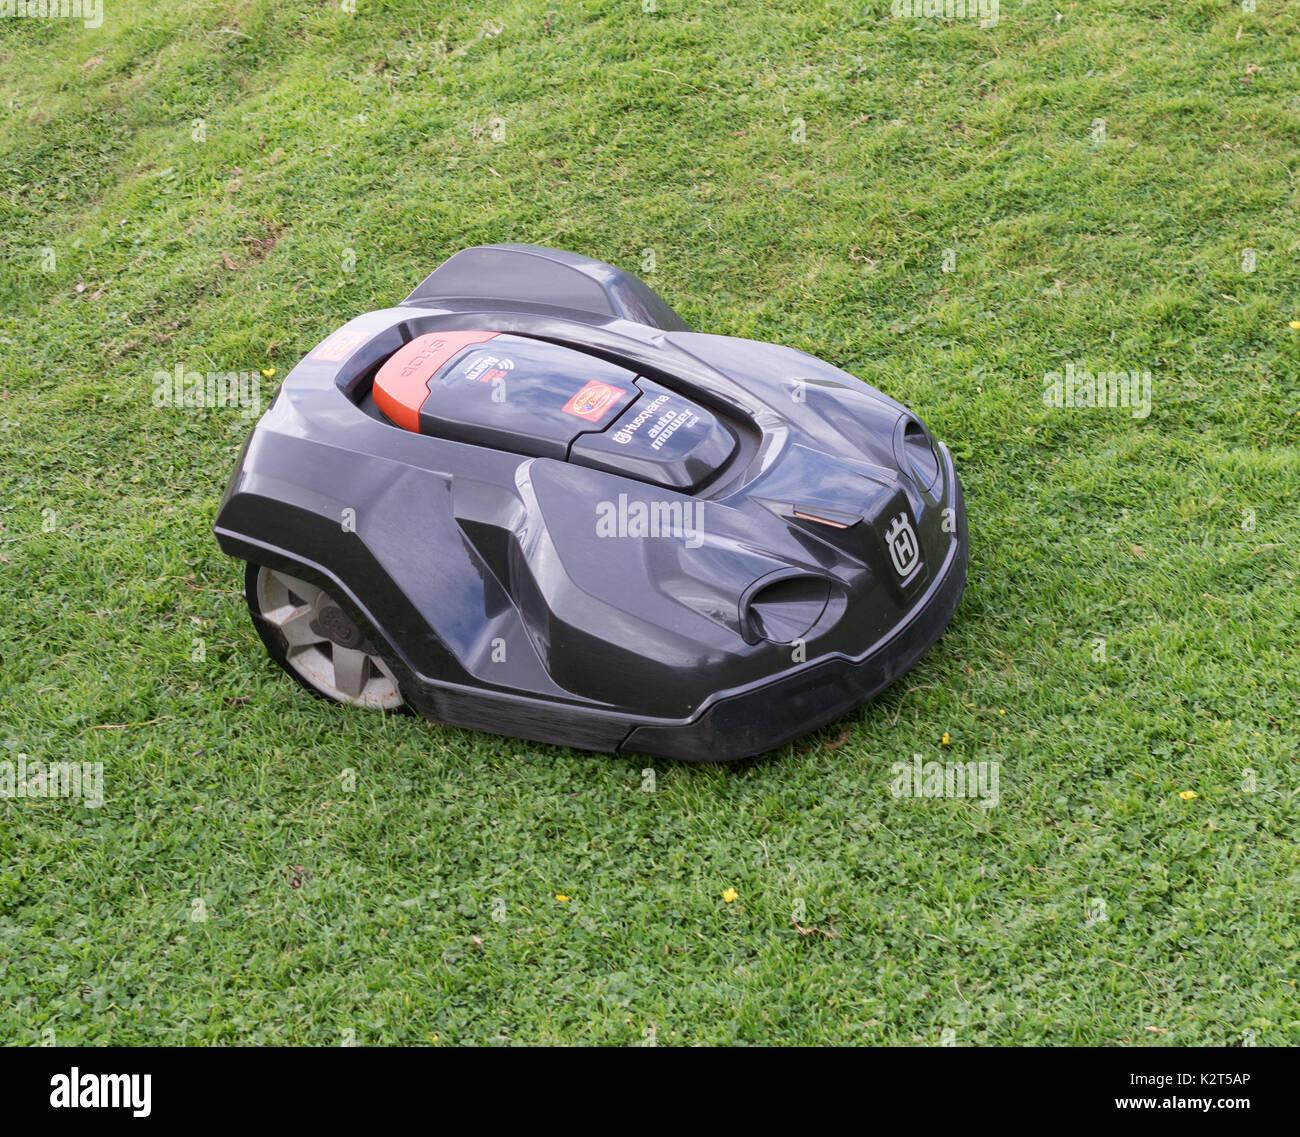 Husqvarna Automower, or robot mower, cutting grass - Stock Image